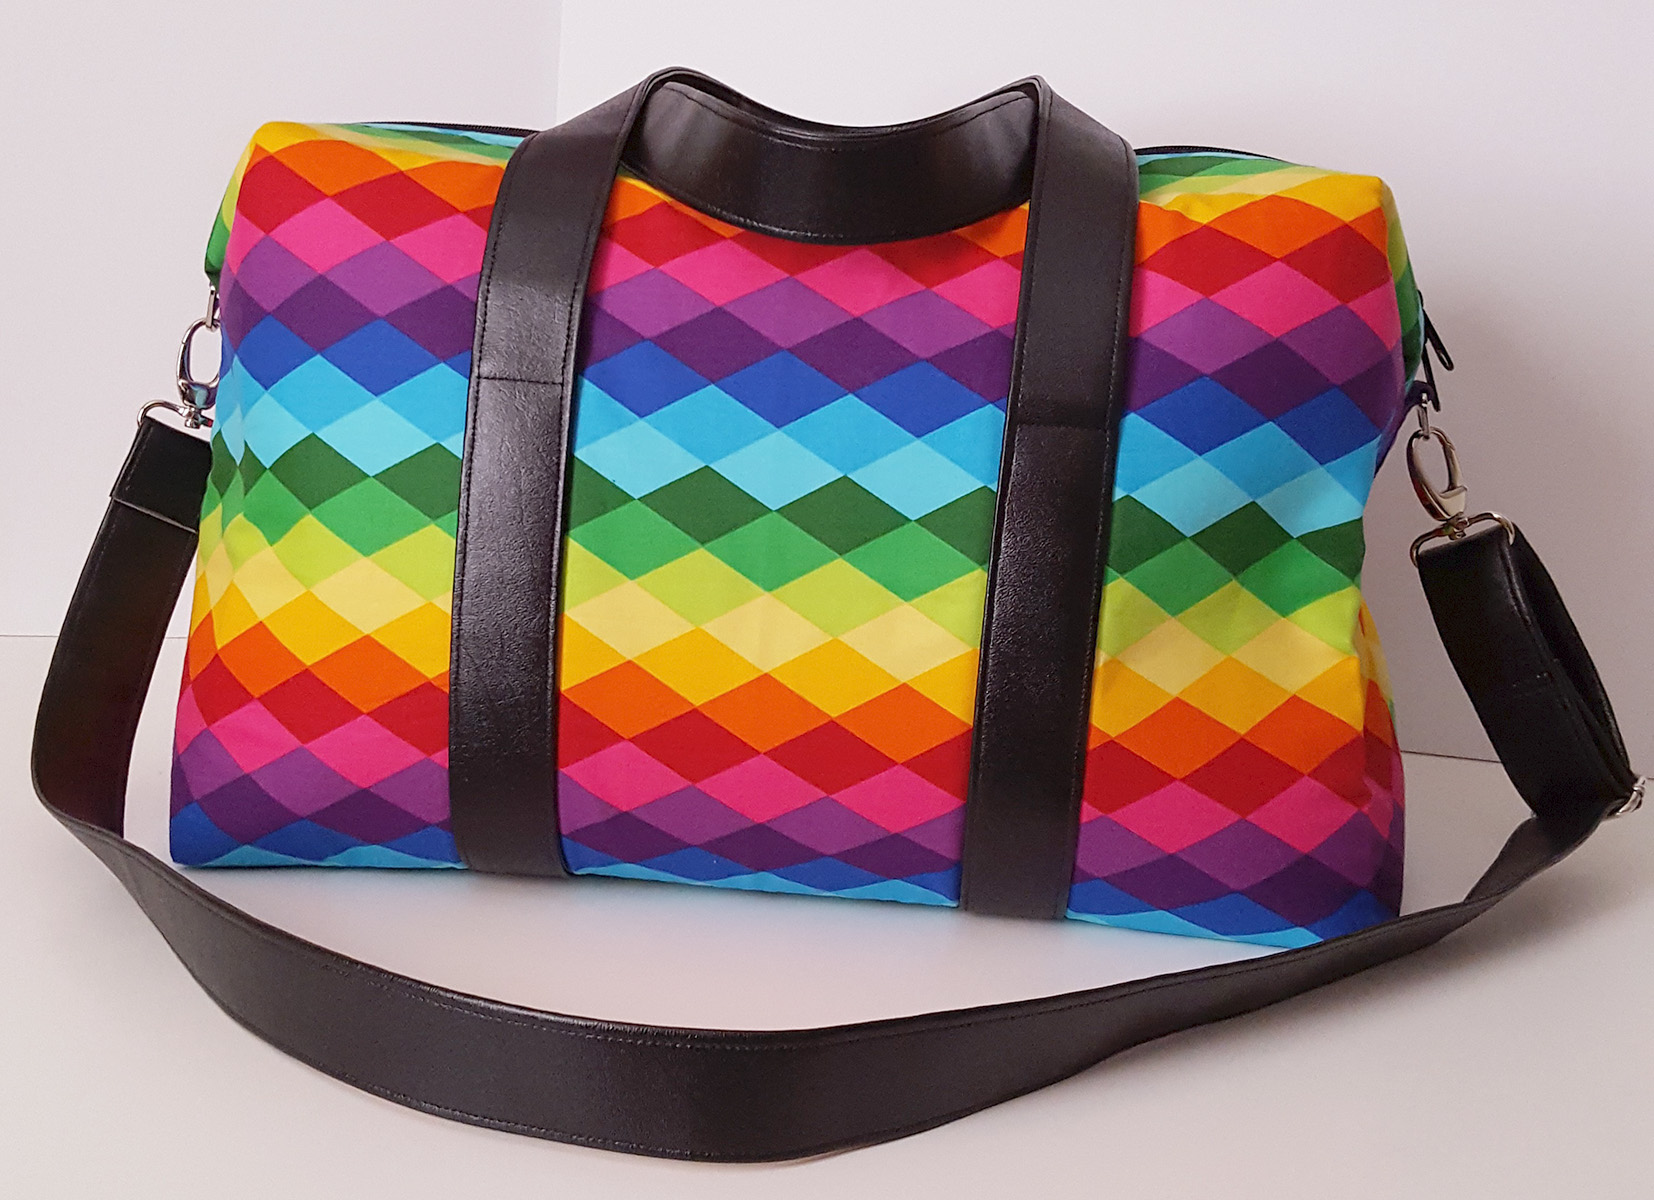 Sew Sweetness Emblem Duffle Bag, sewn by Melissa